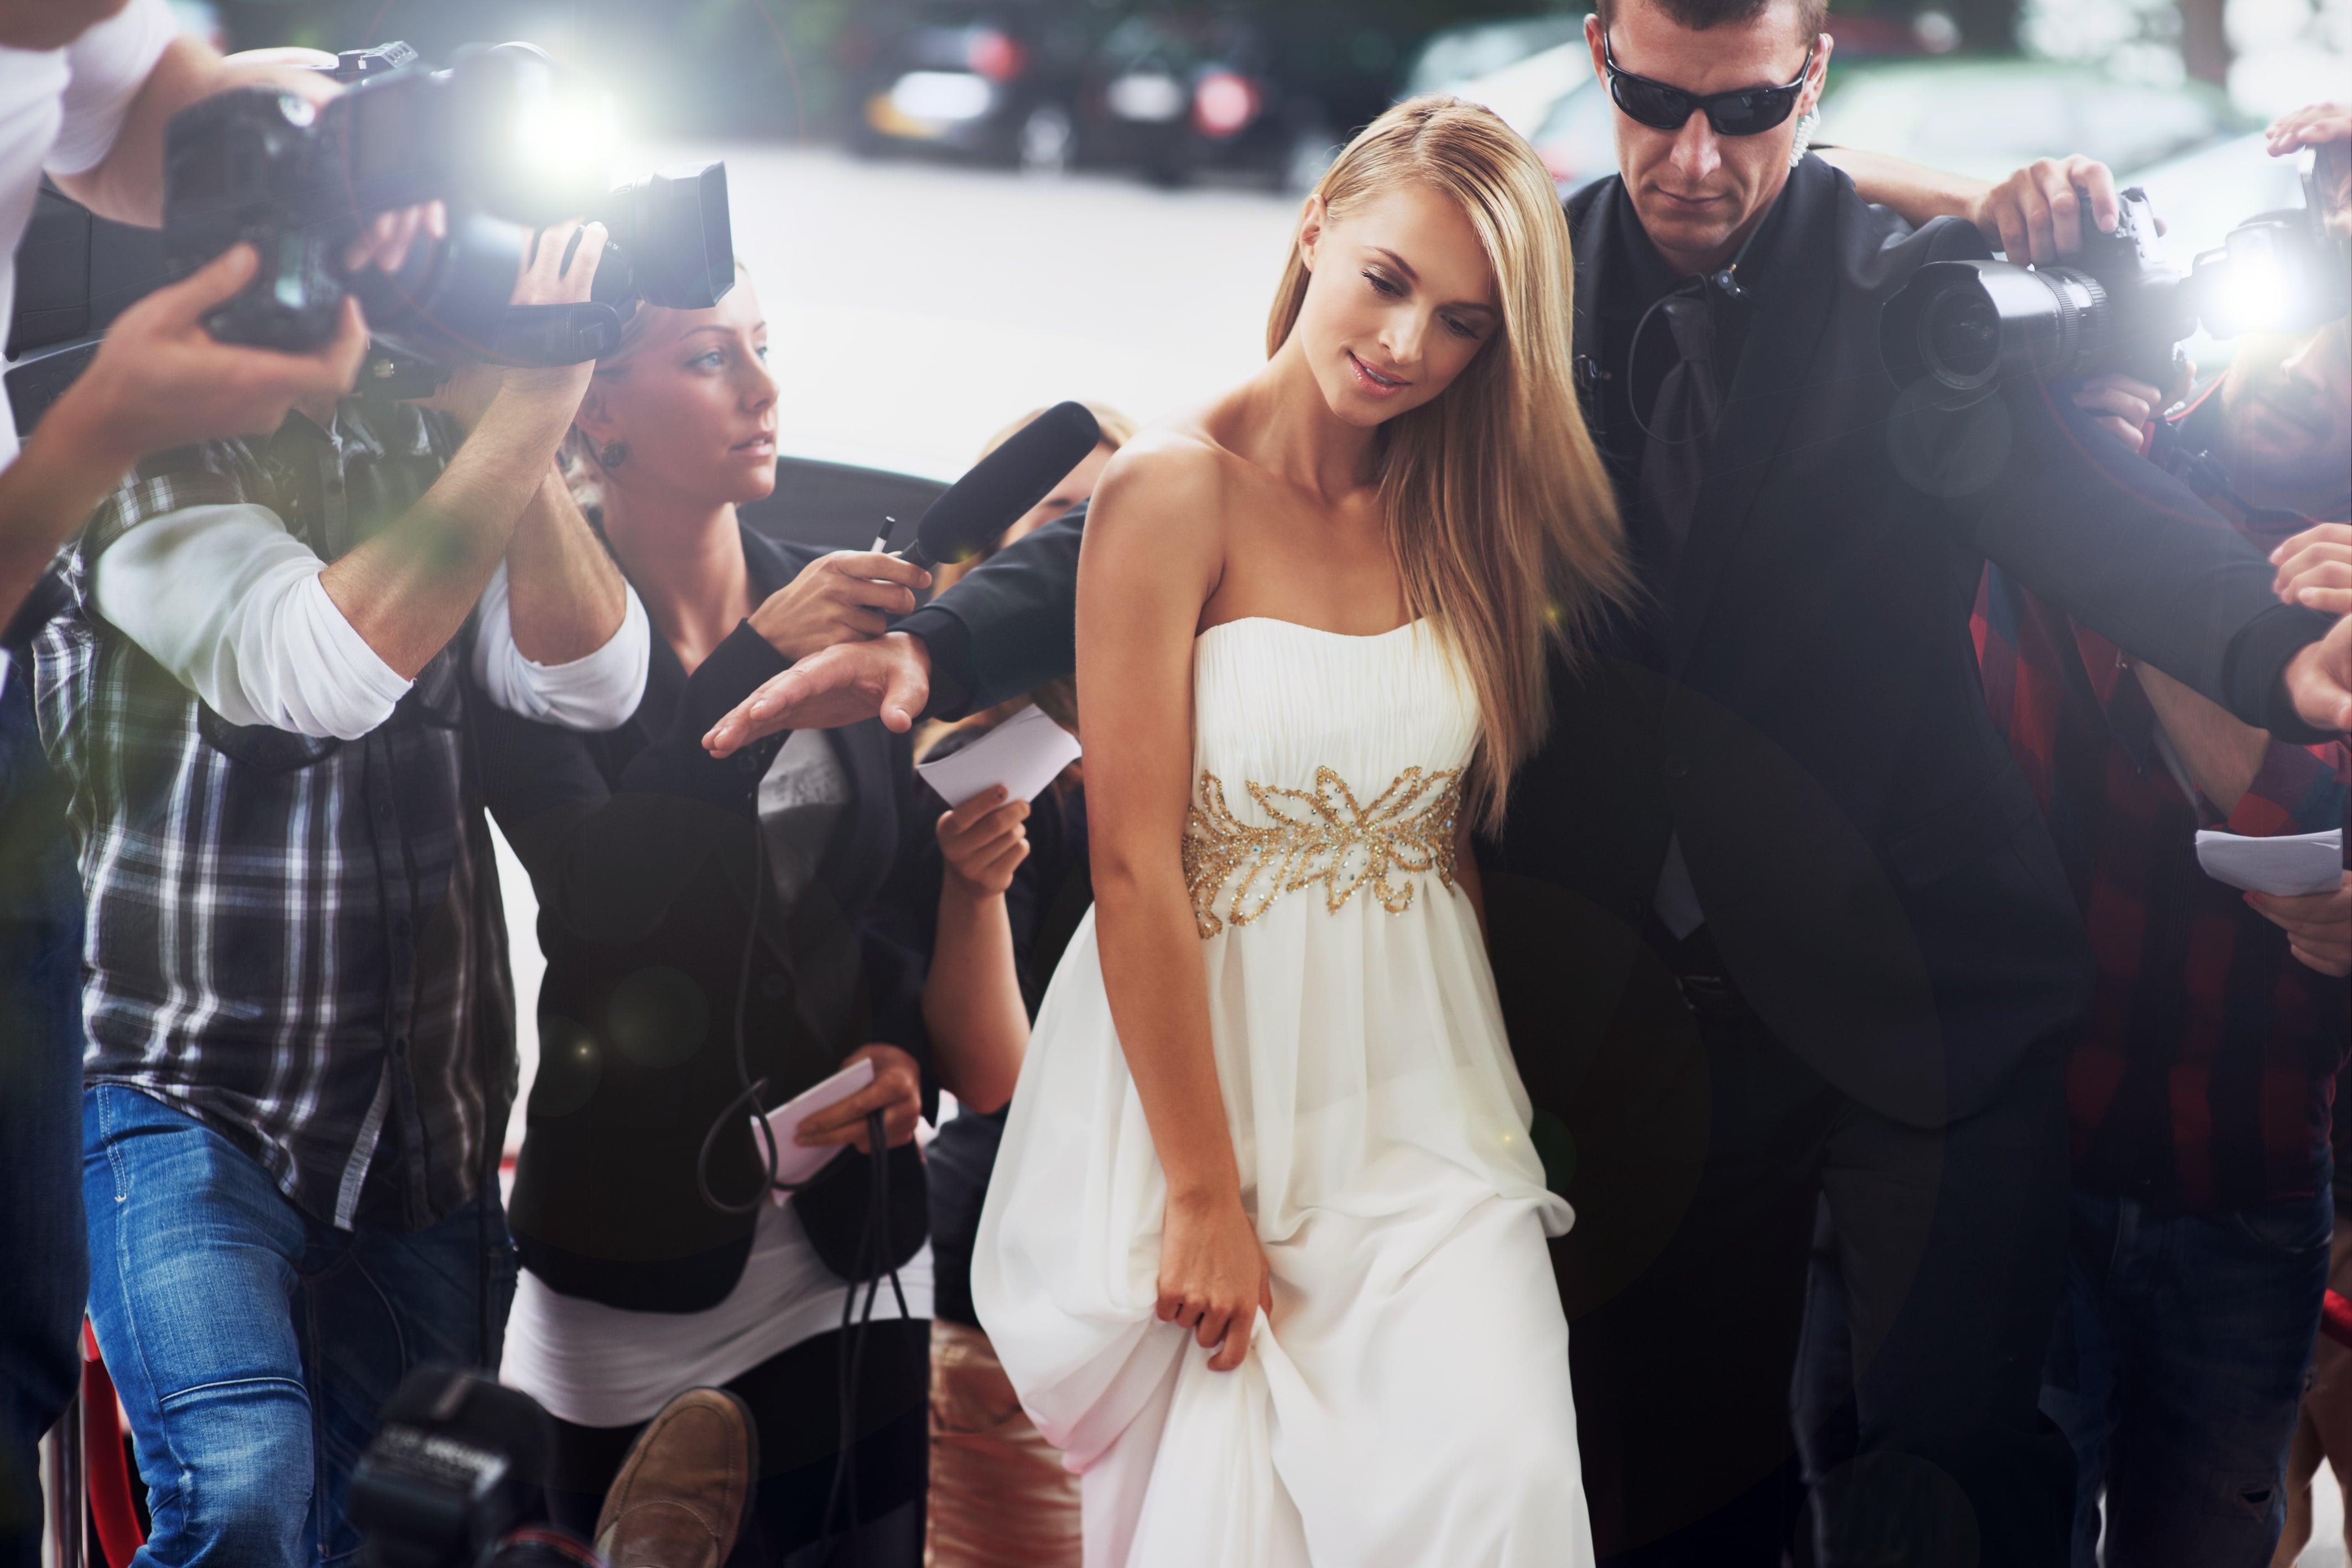 Personal security celebrity escort